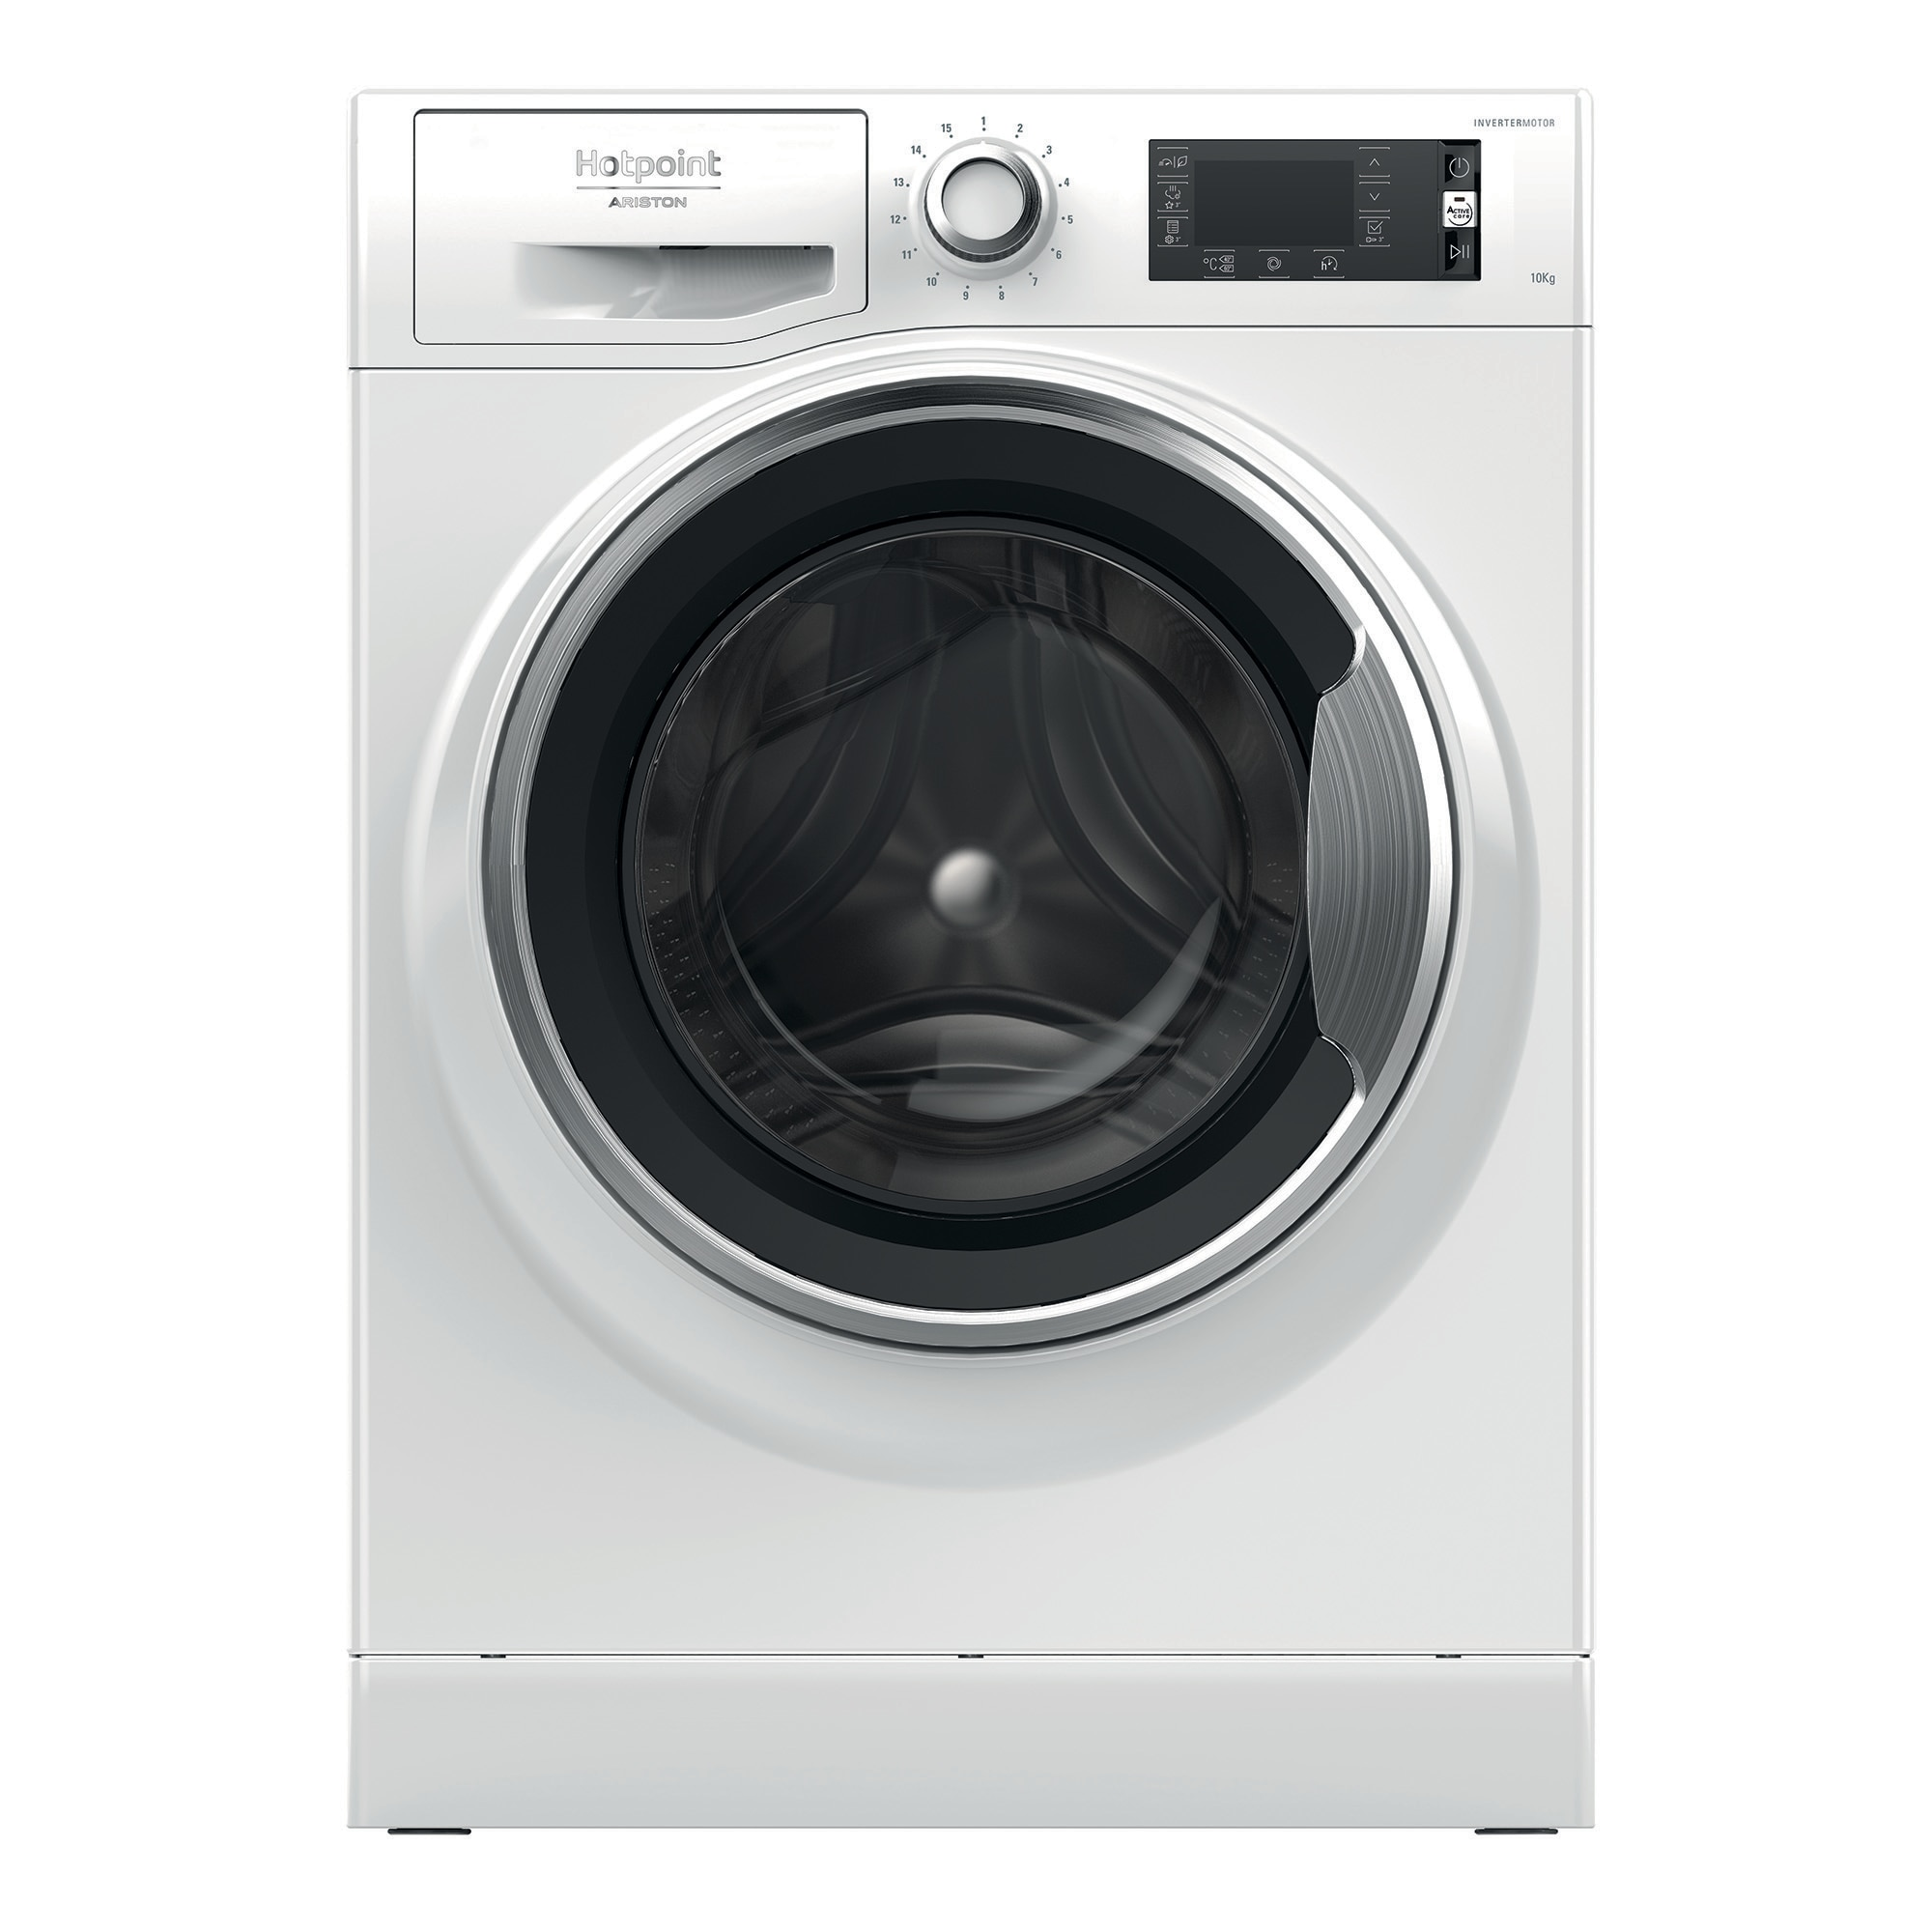 Fotografie Masina de spalat rufe Hotpoint NLLCD 1047 WC AD EU, 10 kg, 1400 RPM, Clasa A+++, Sistem Active Care, Sistem Stop&Add, Sistem igienizare aburi, Alb